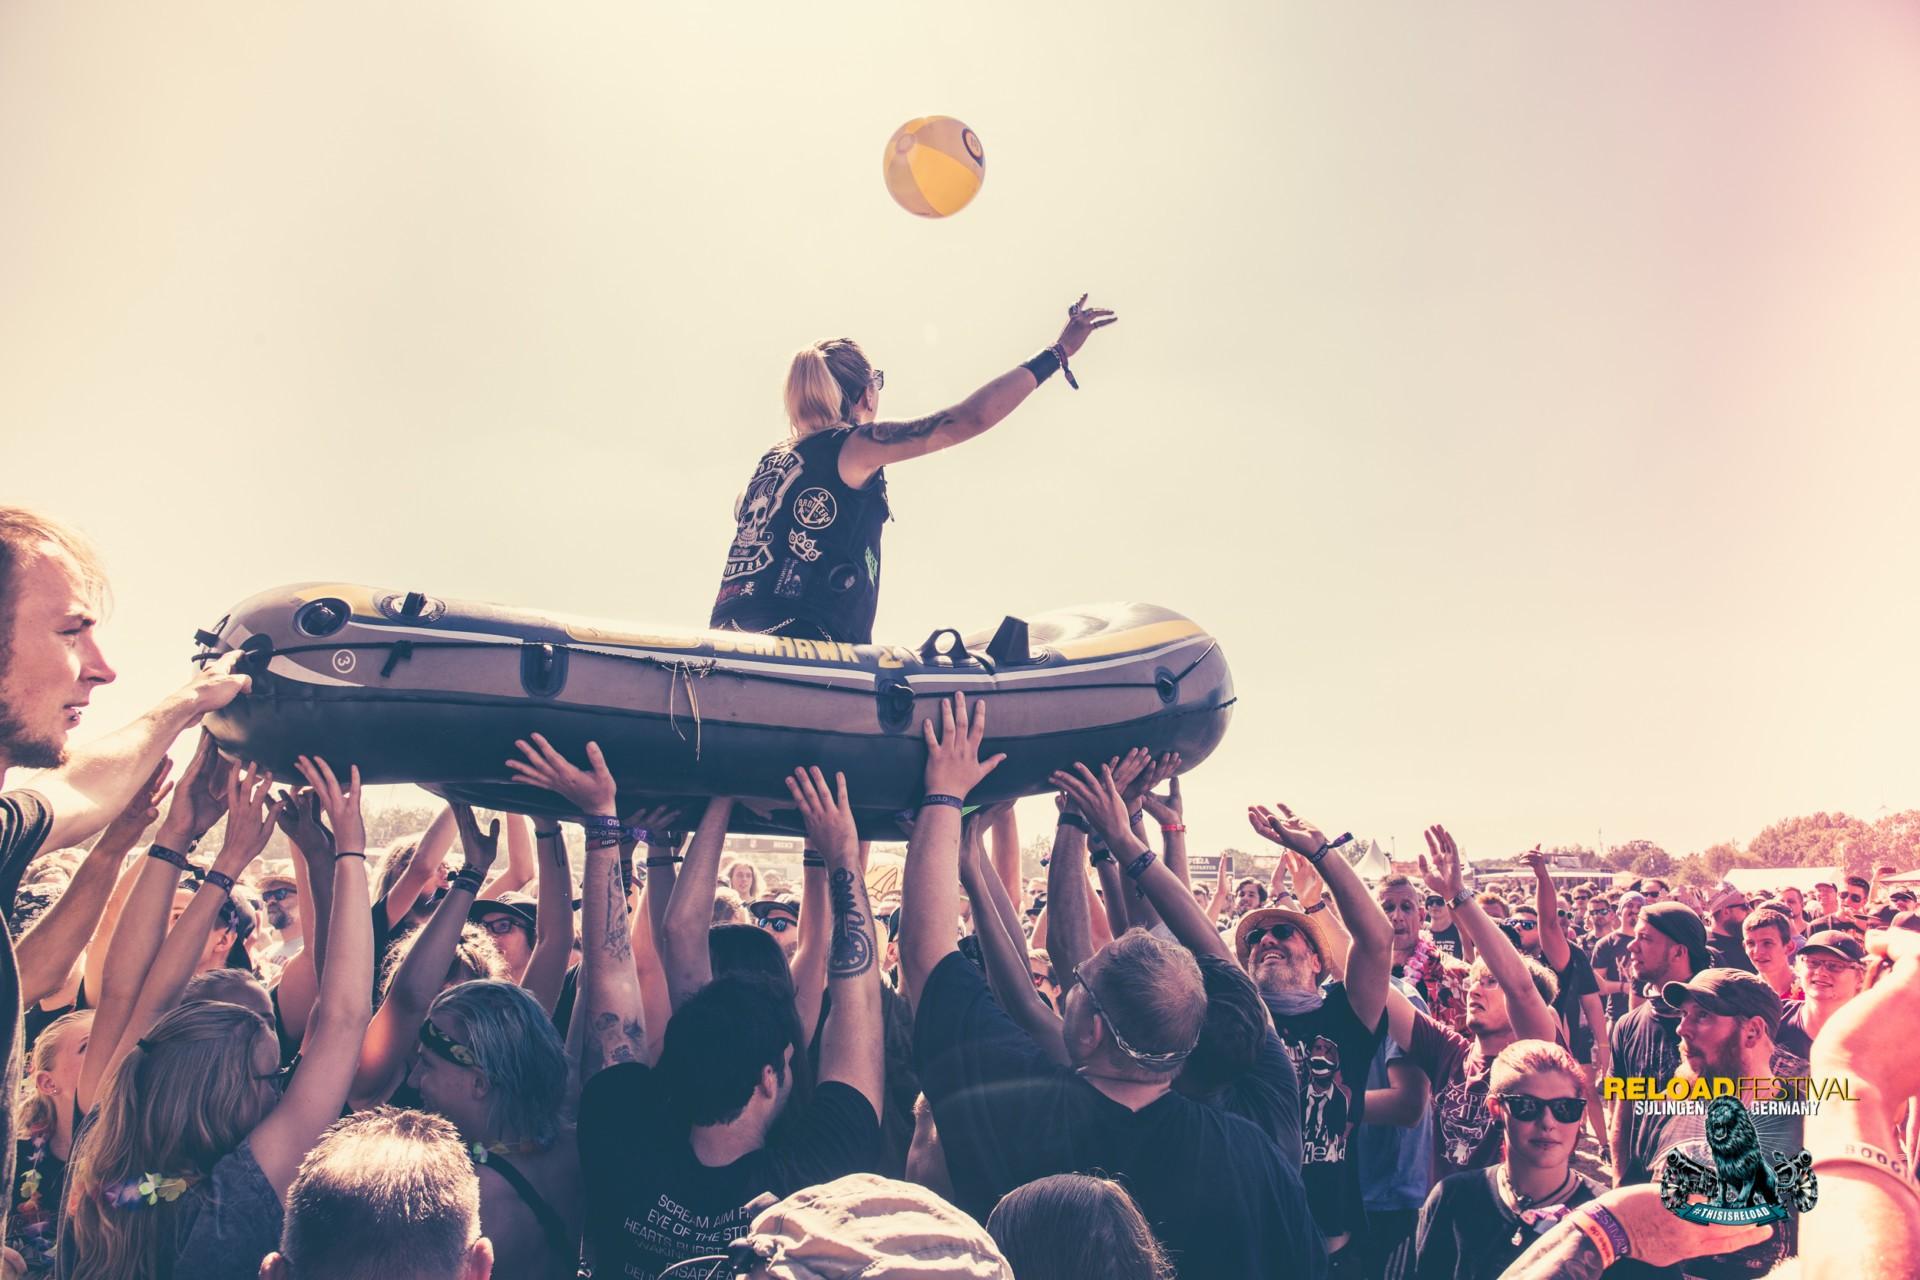 reload 13 - REVIEW: RELOAD FESTIVAL 2019